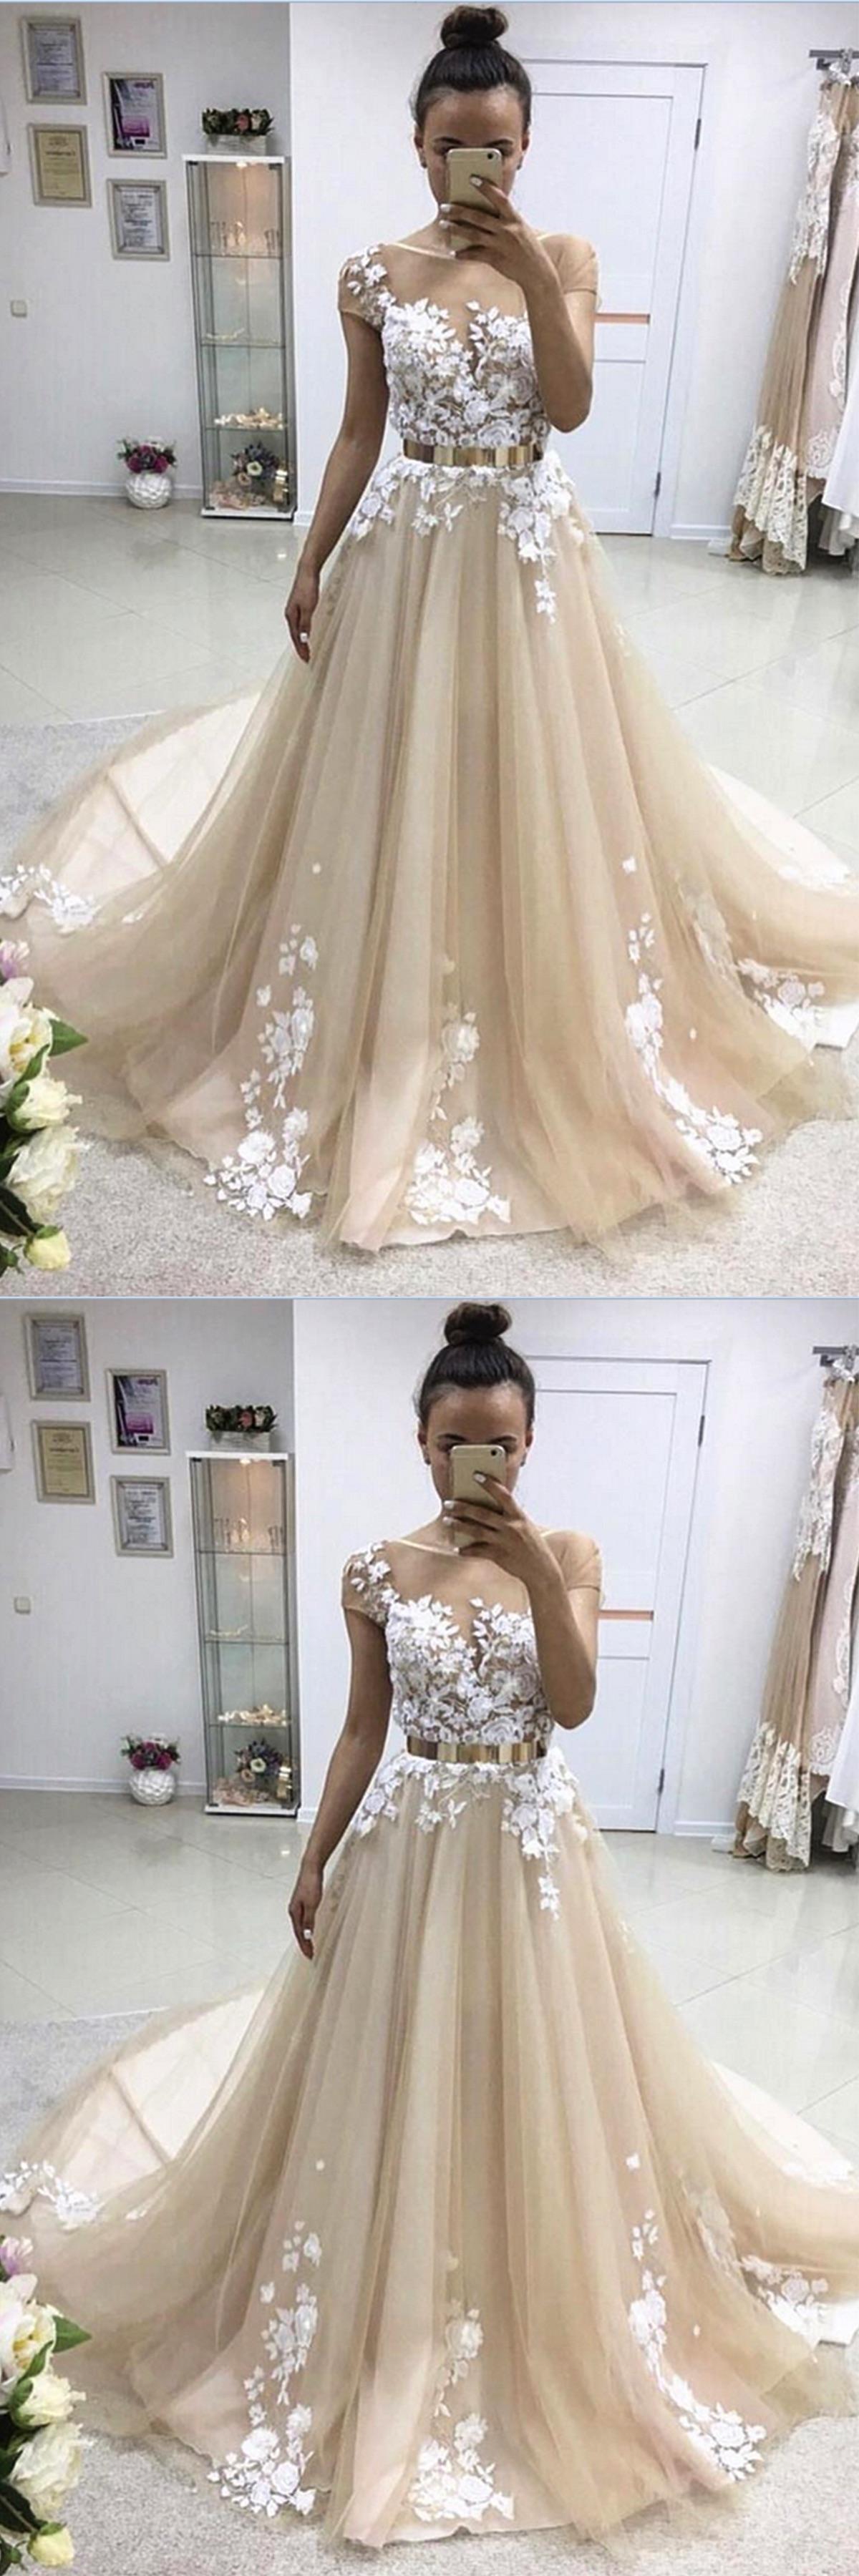 Gold belt for wedding dress   spring Aline long short sleeves senior prom dresses with gold